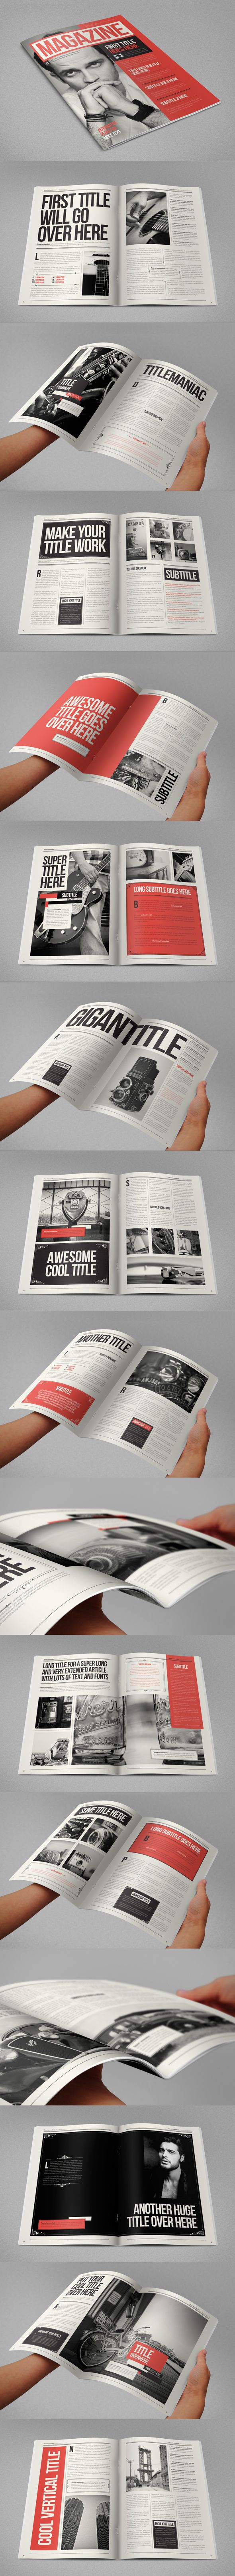 Layout design / Retro Vintage Magazine on Editorial Design Served